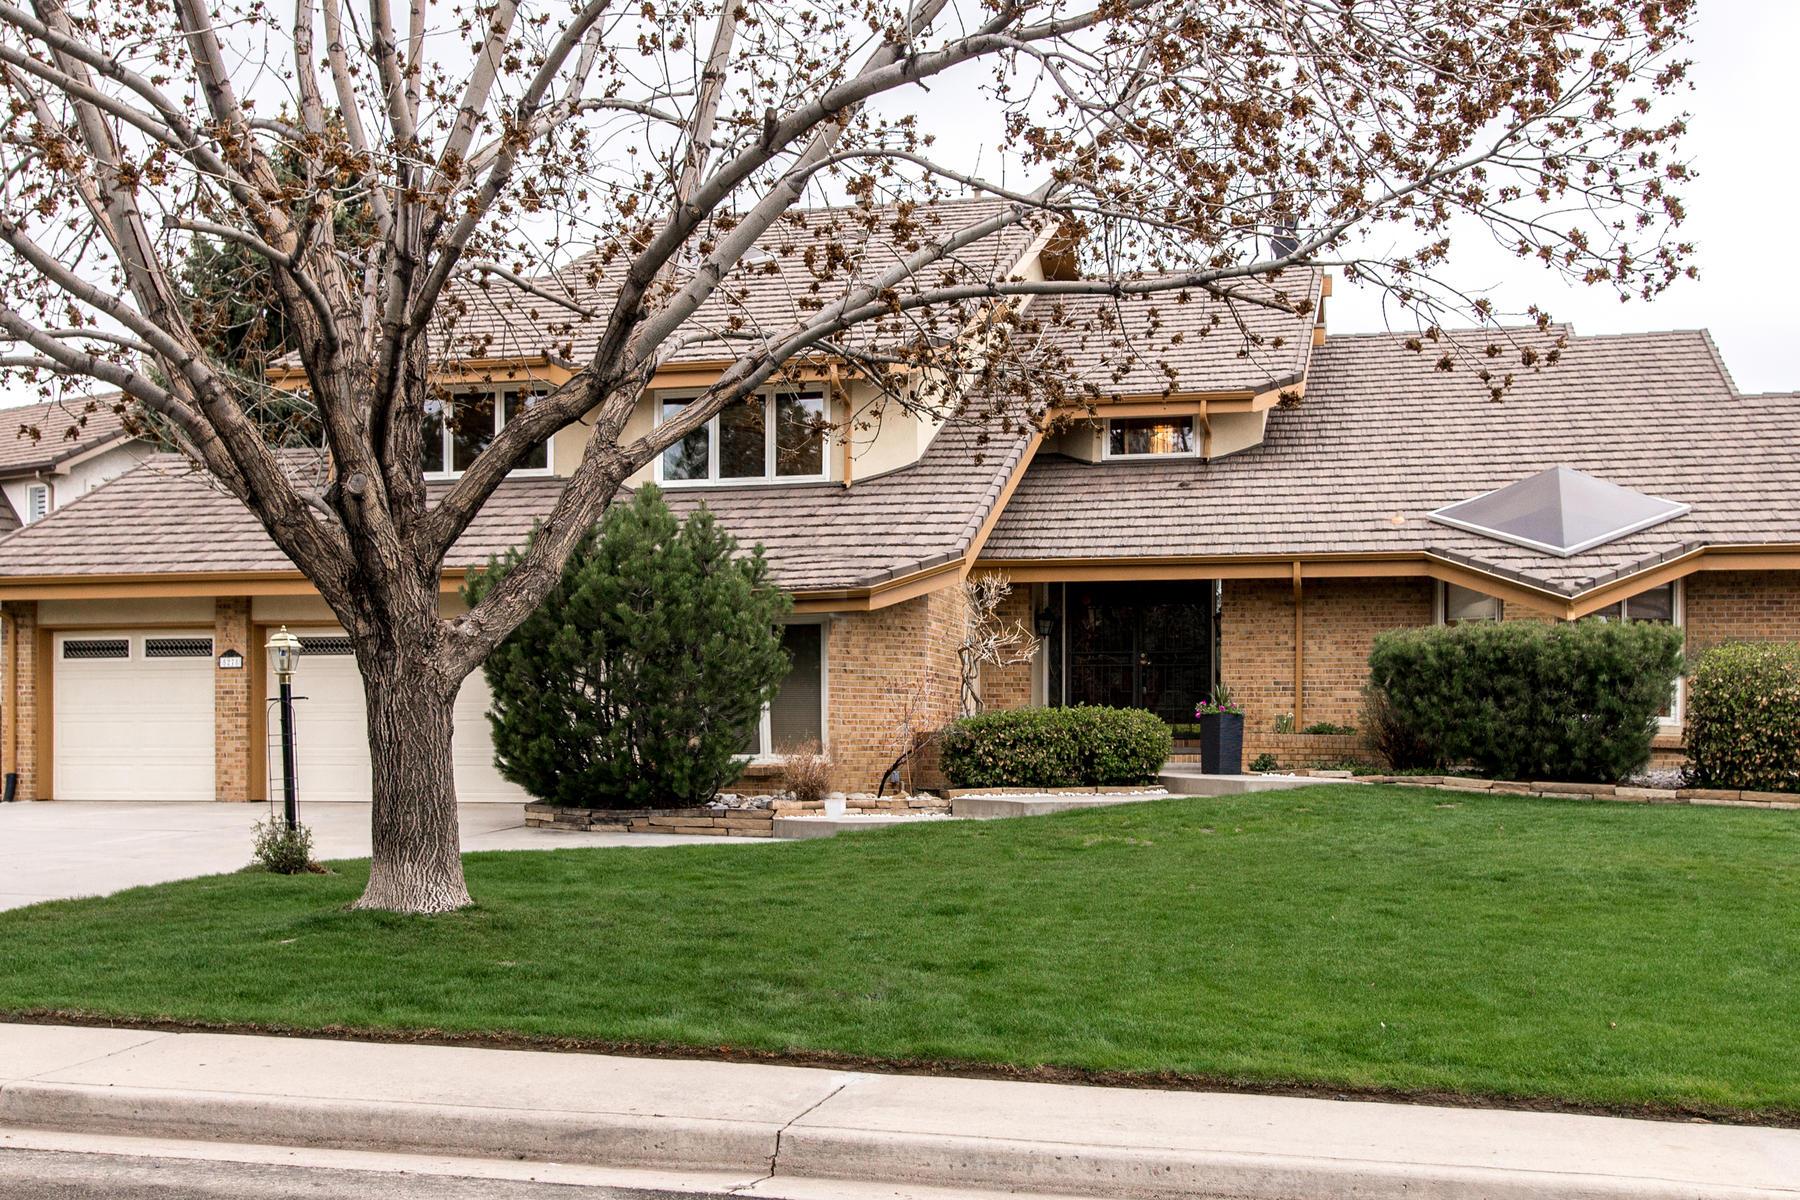 Single Family Homes για την Πώληση στο Heritage Greens 5278 E Otero Circle, Centennial, Κολοραντο 80122 Ηνωμένες Πολιτείες